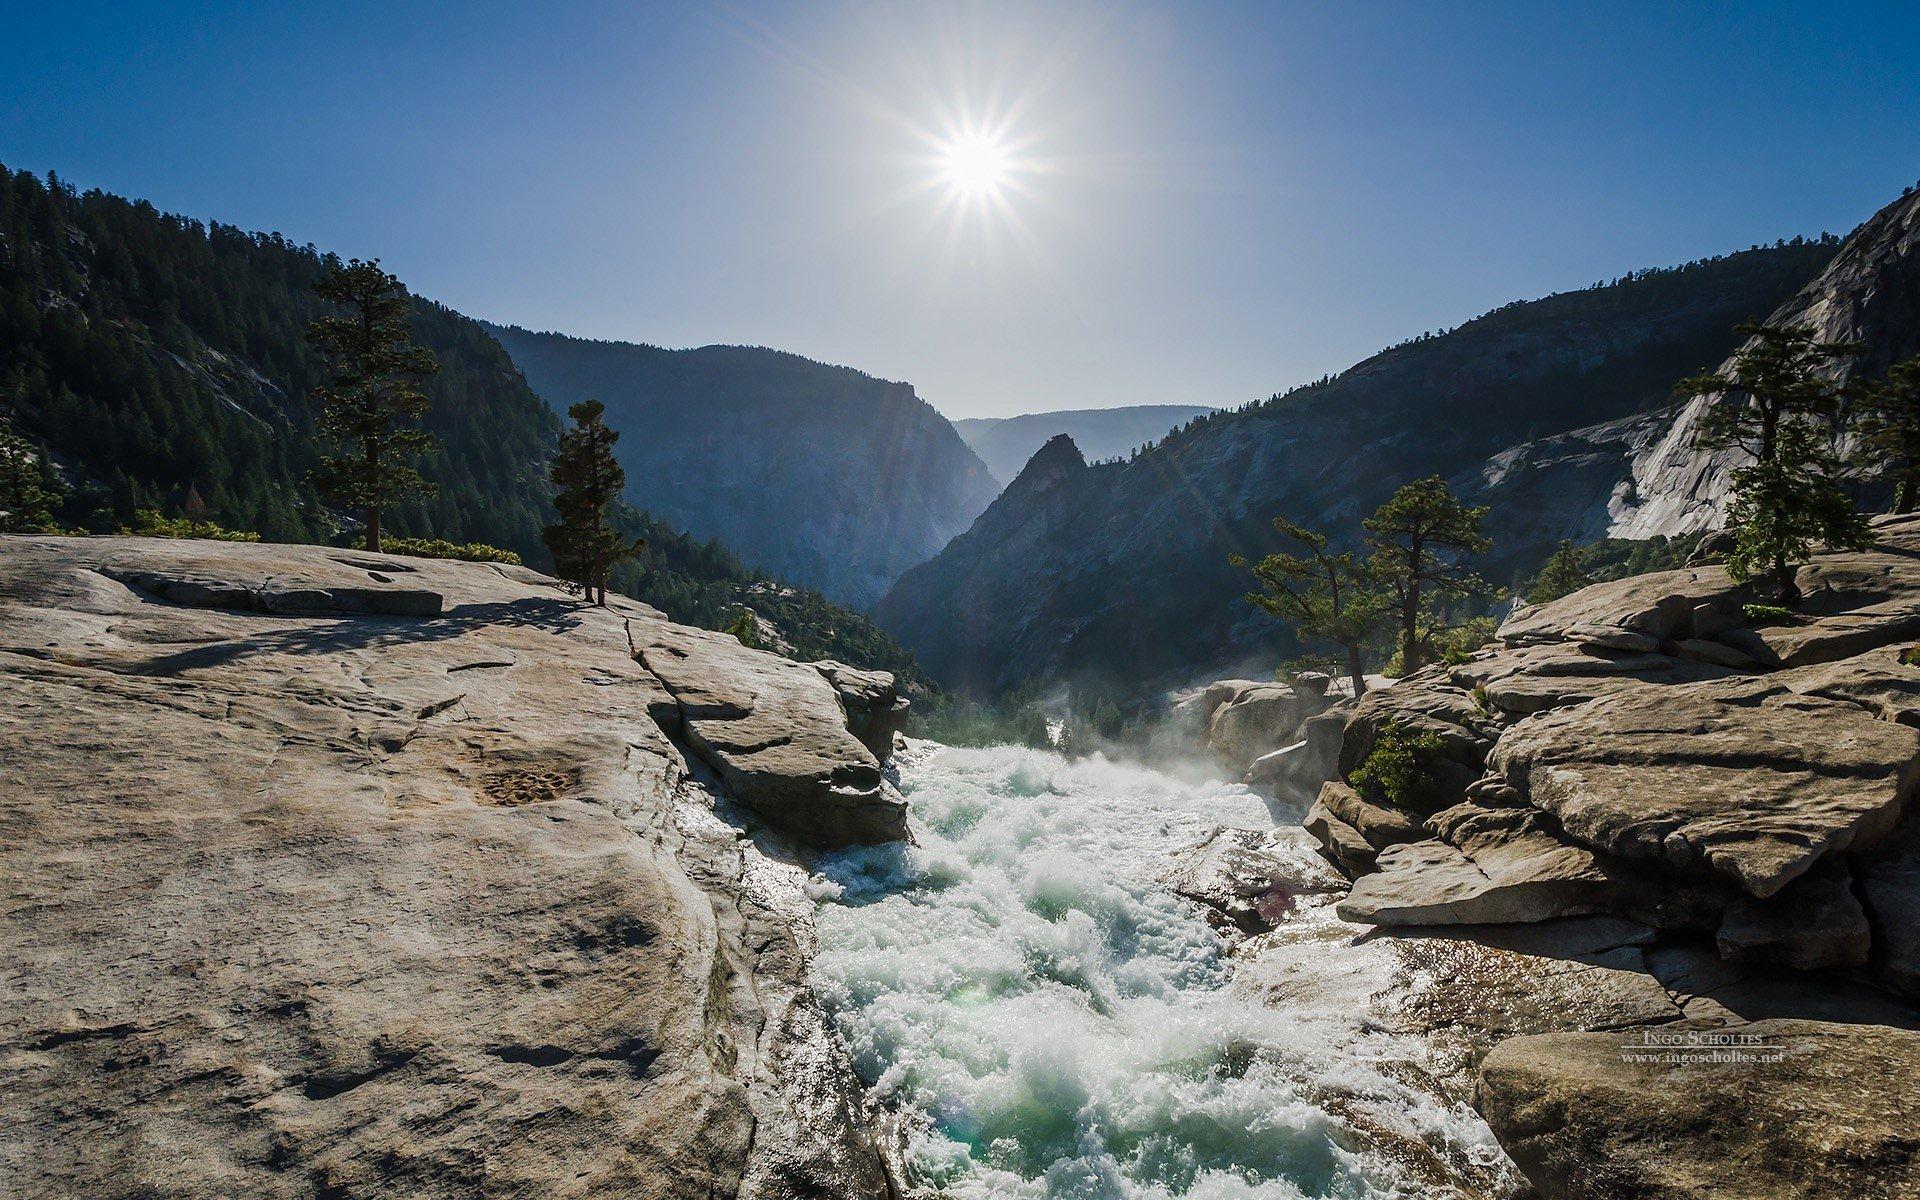 Wallpaper Waterfall of Yosemite National Park